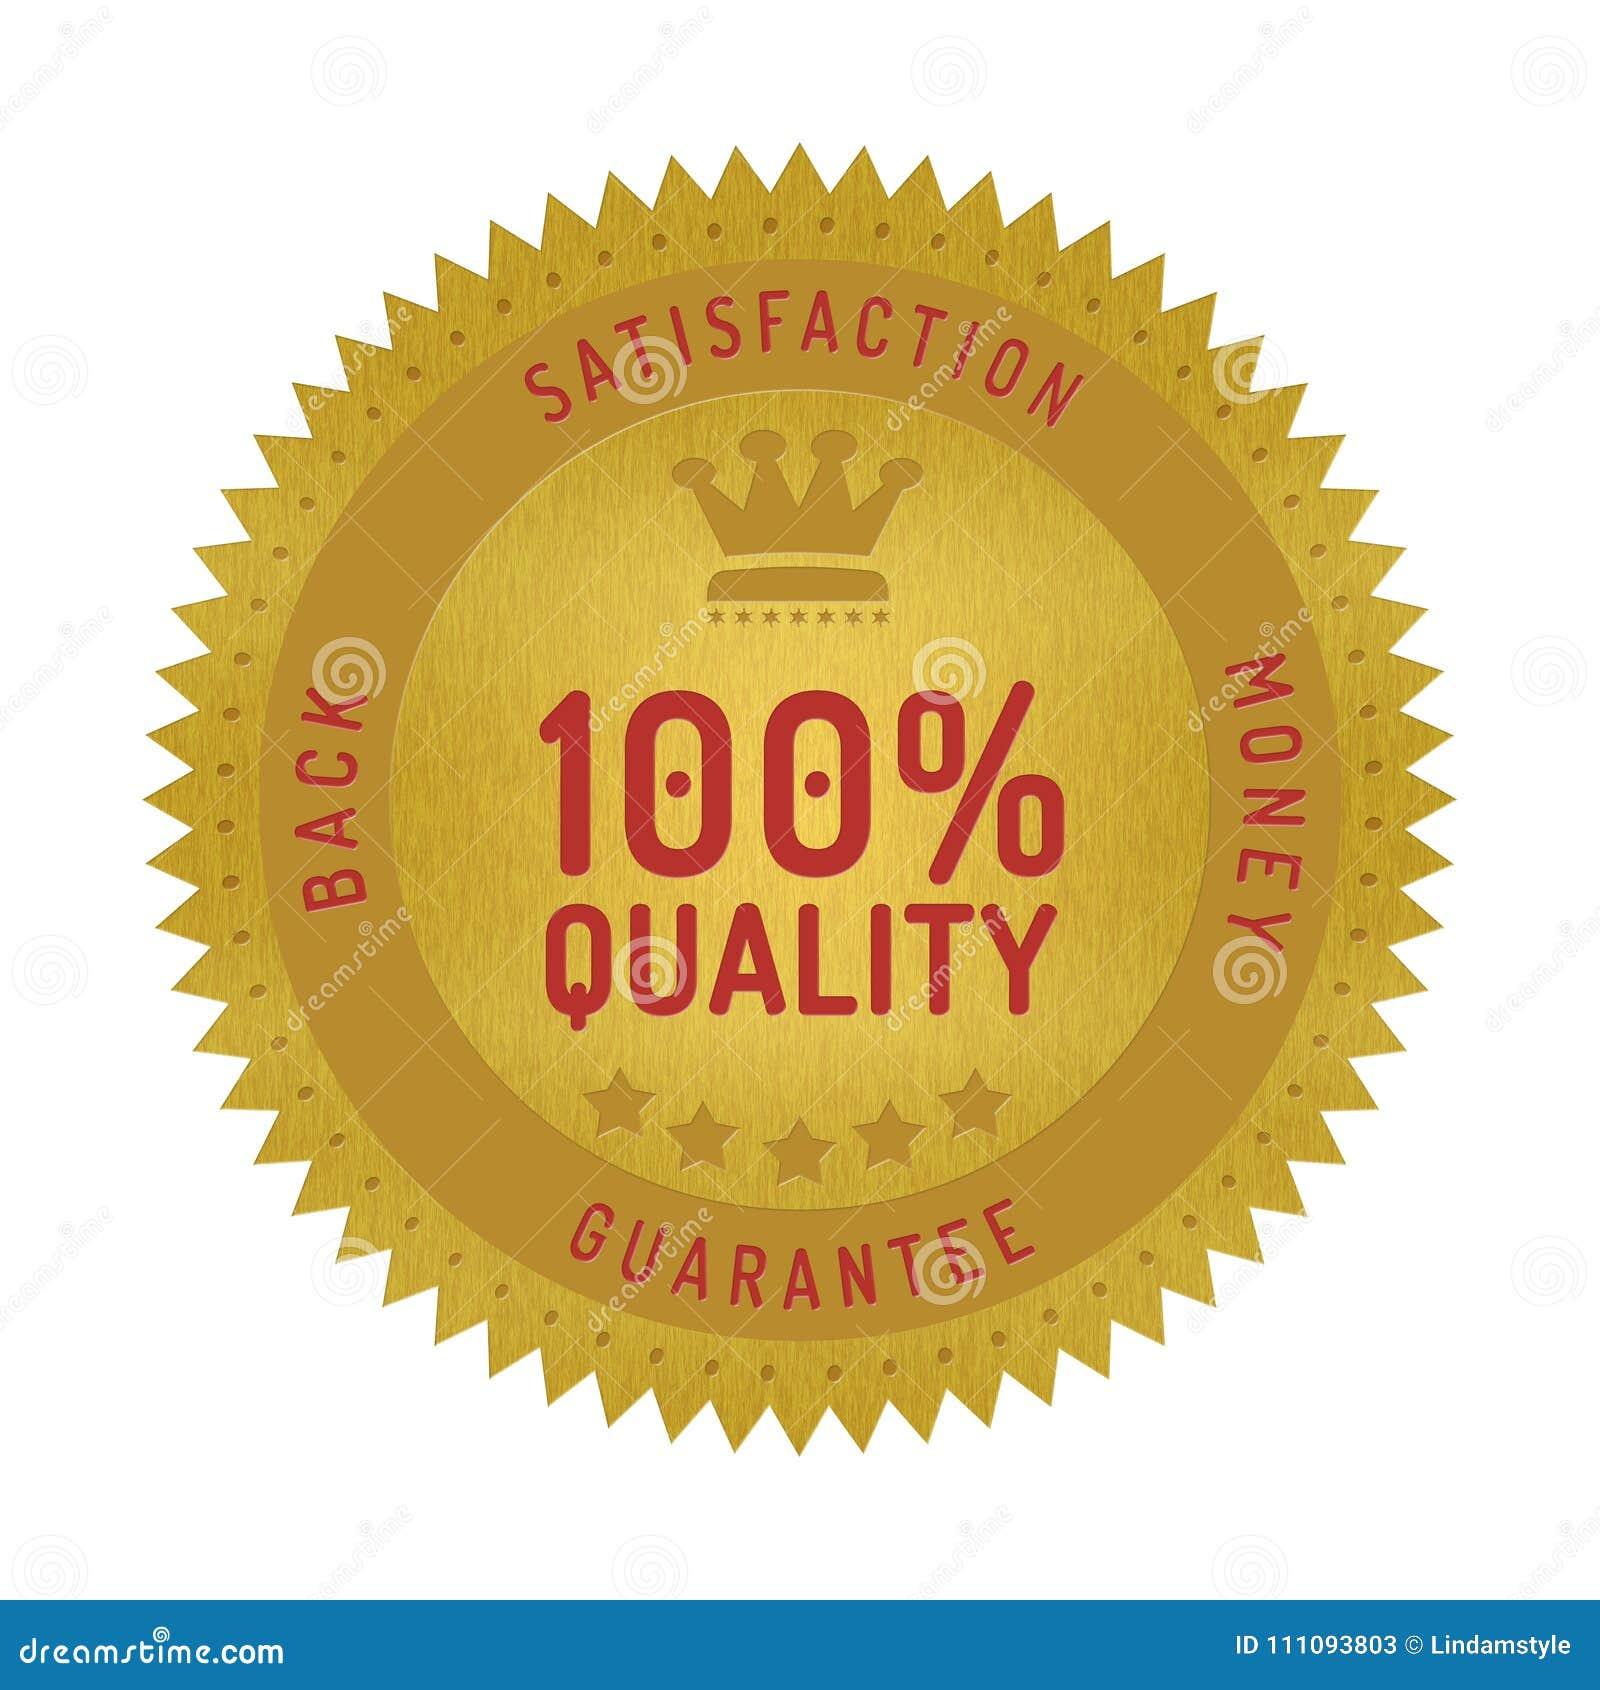 Quality guarantee badge isolated on white